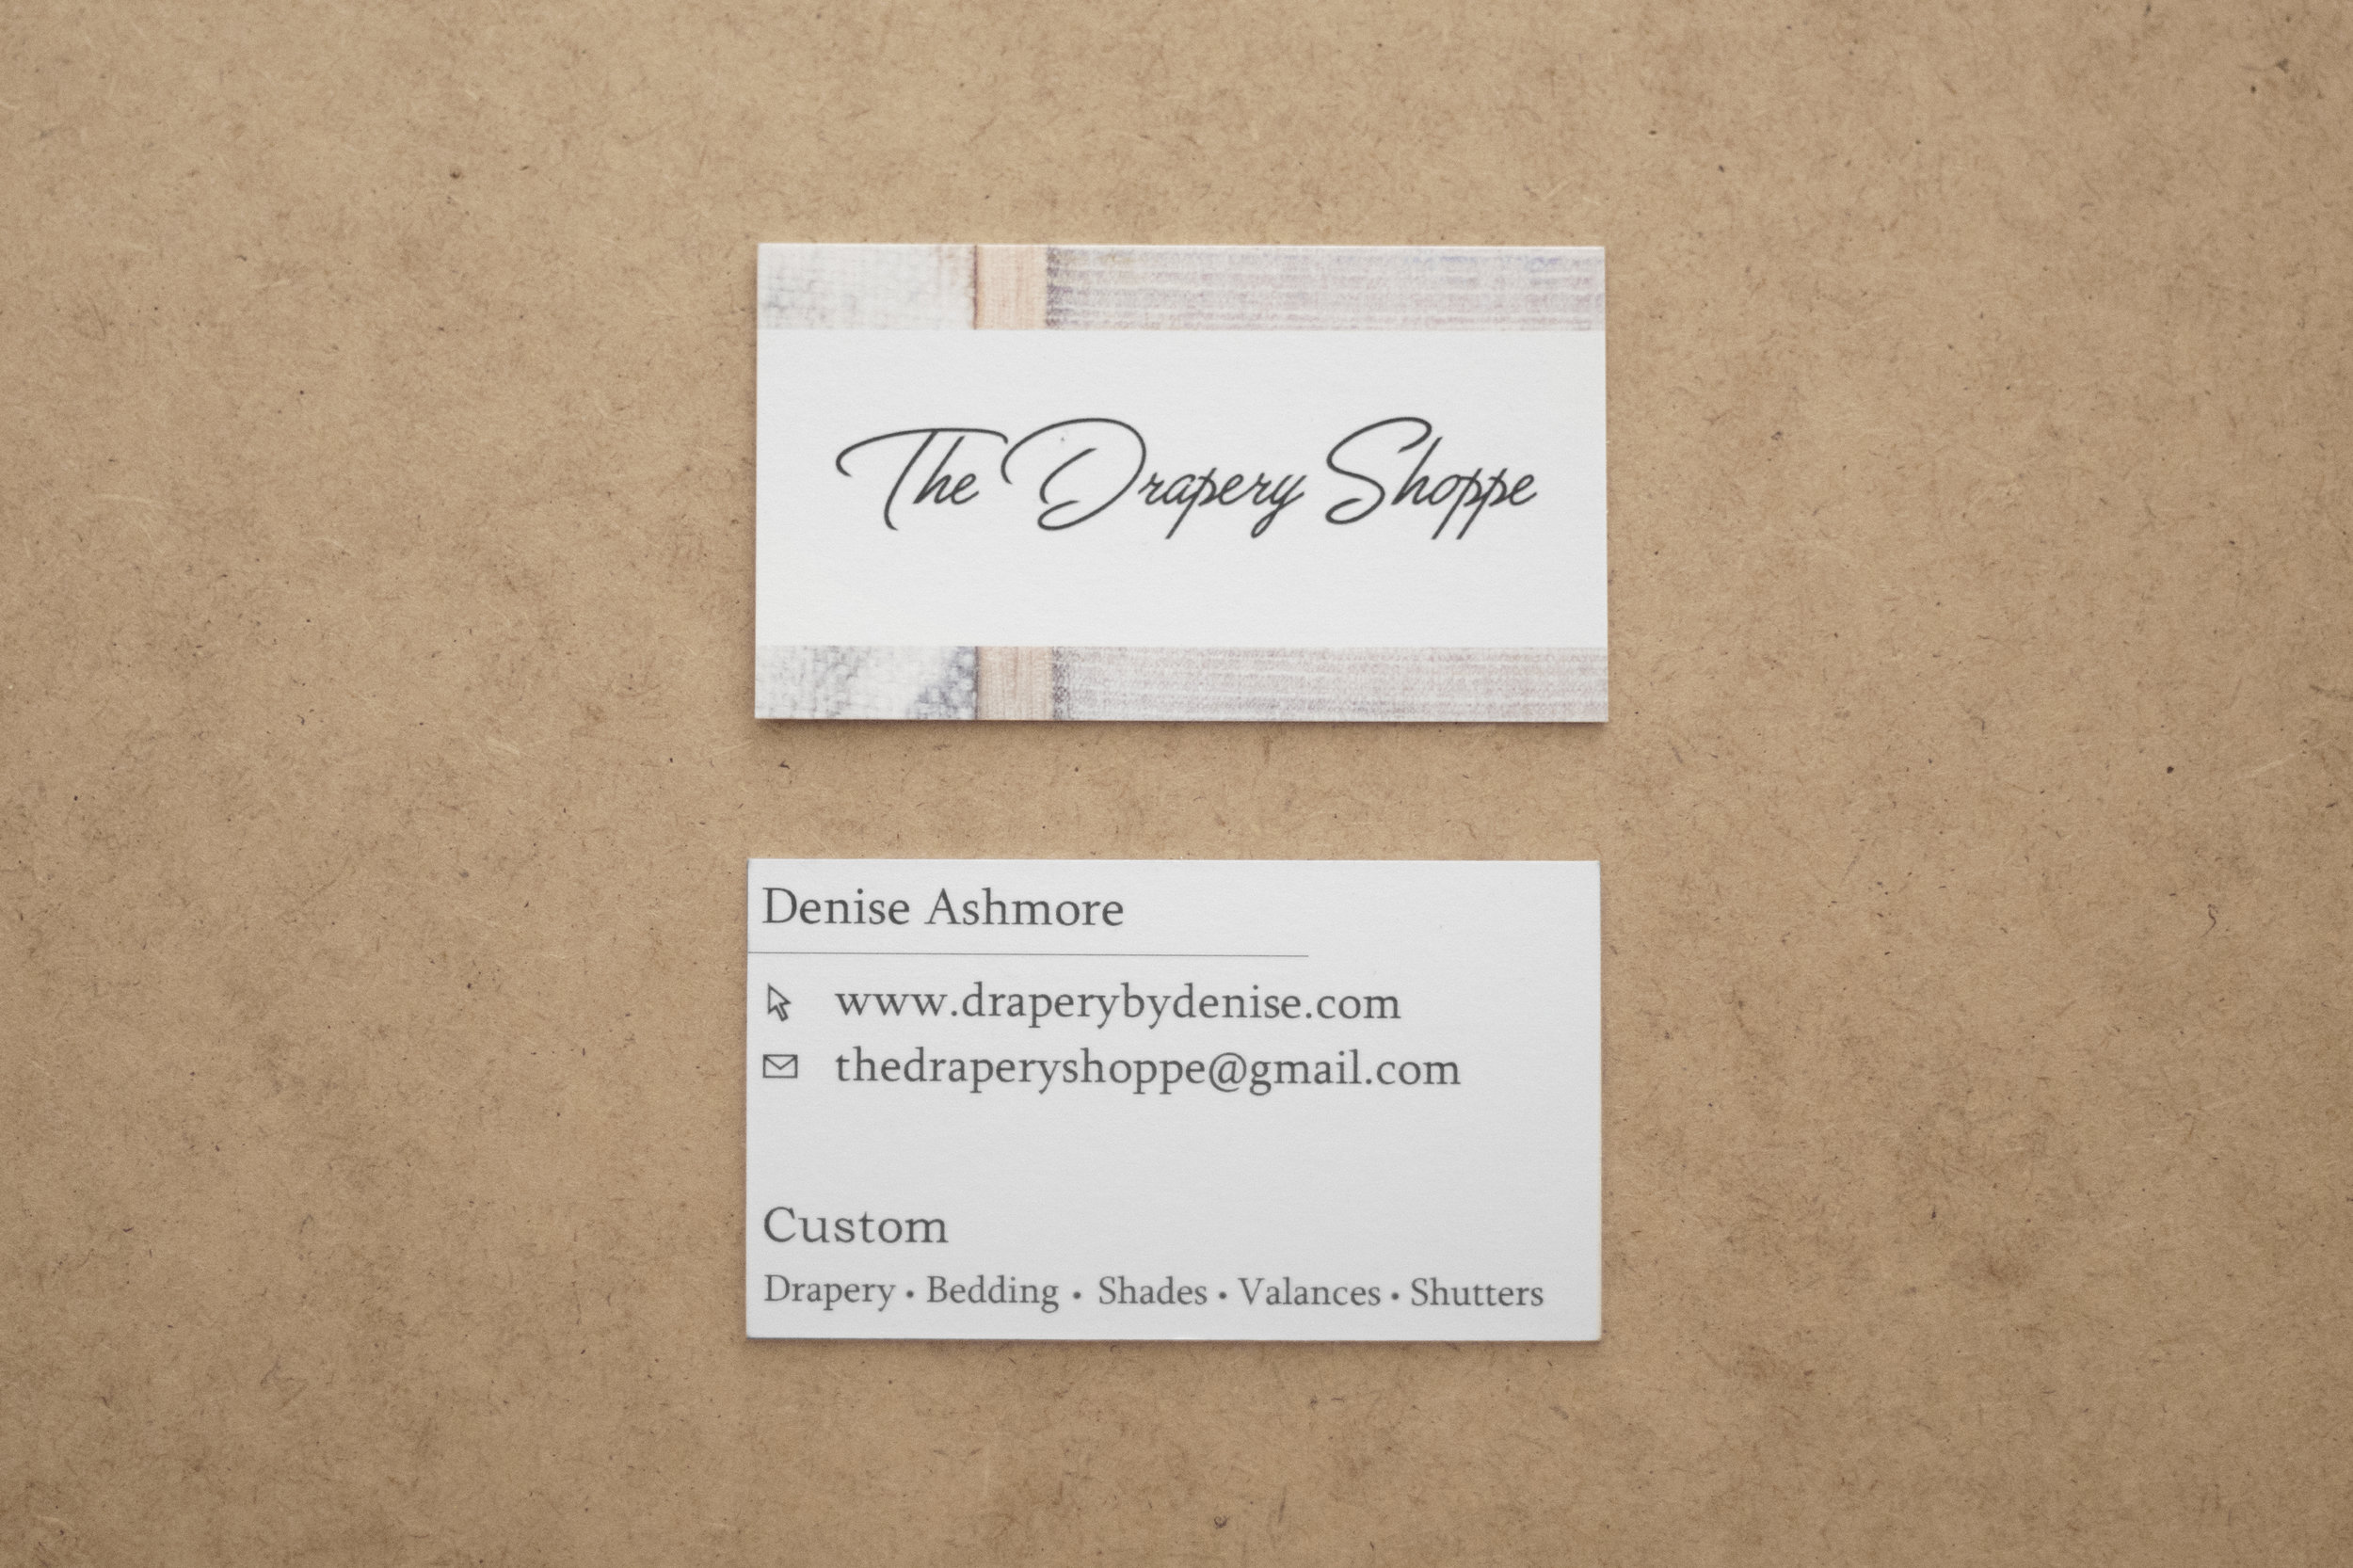 drapery-shoppe-businesscard2.jpg